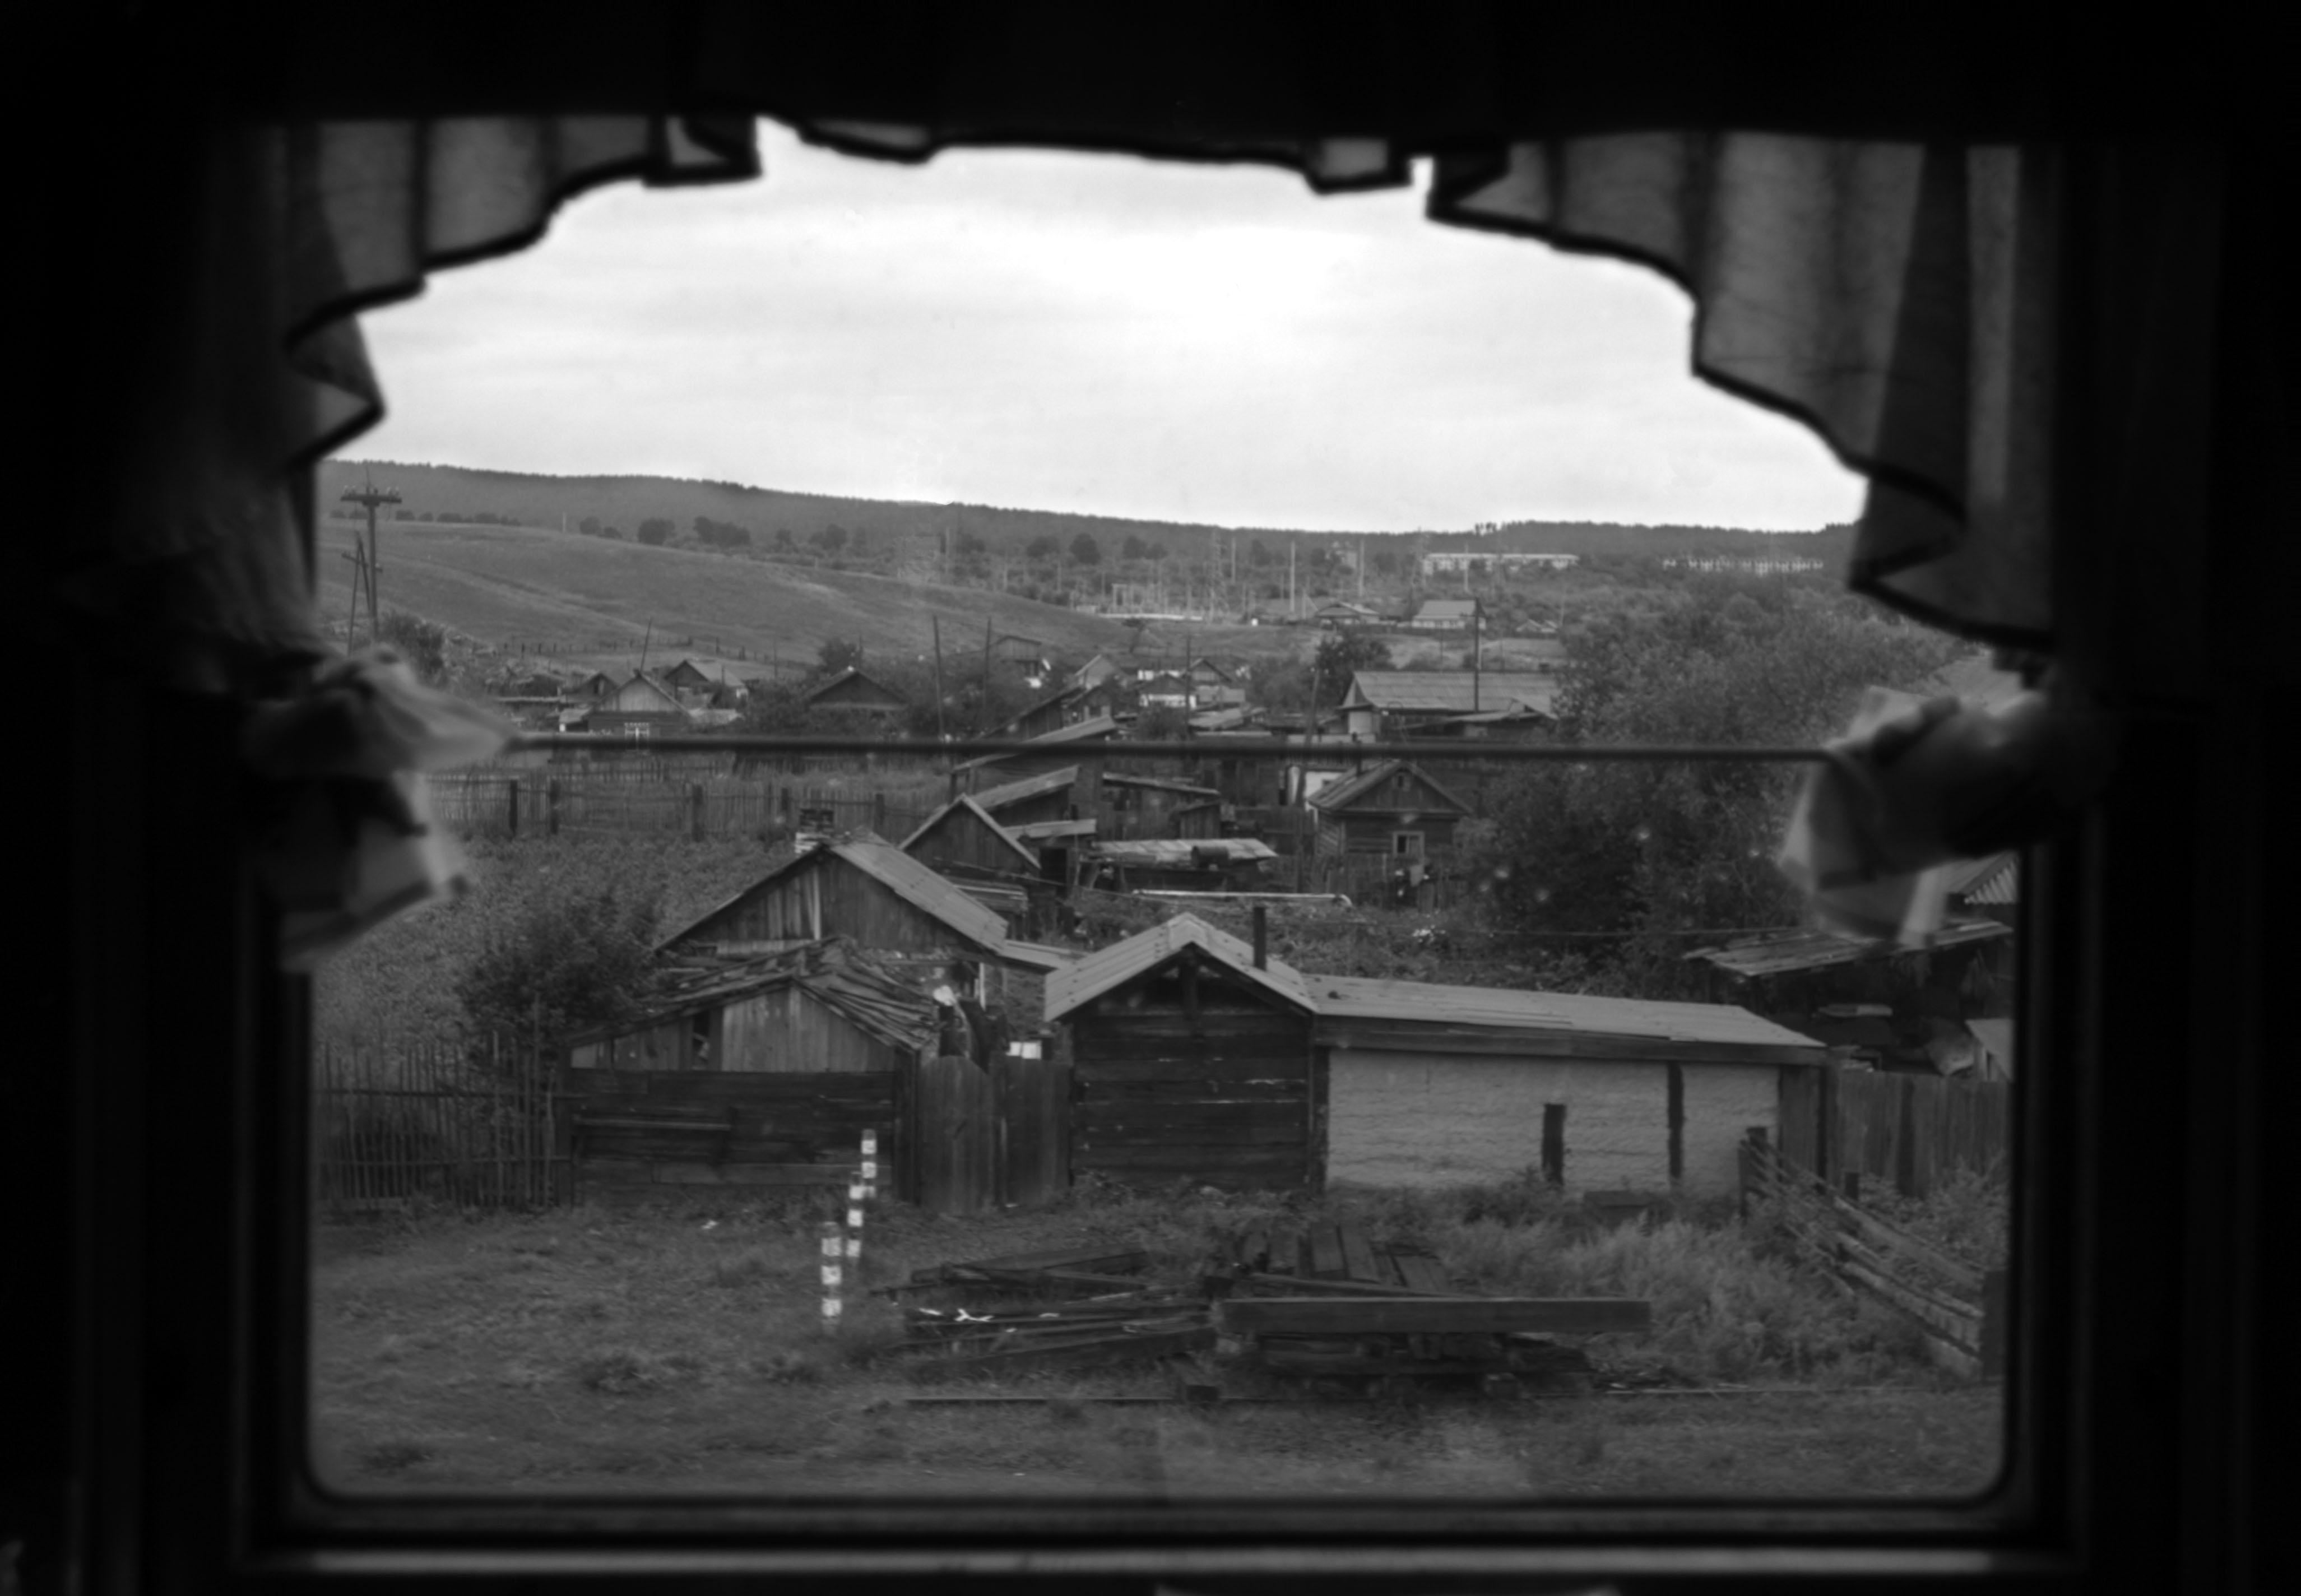 Transiberiano. Siberia, Rusia, 2007<br/>Giclée